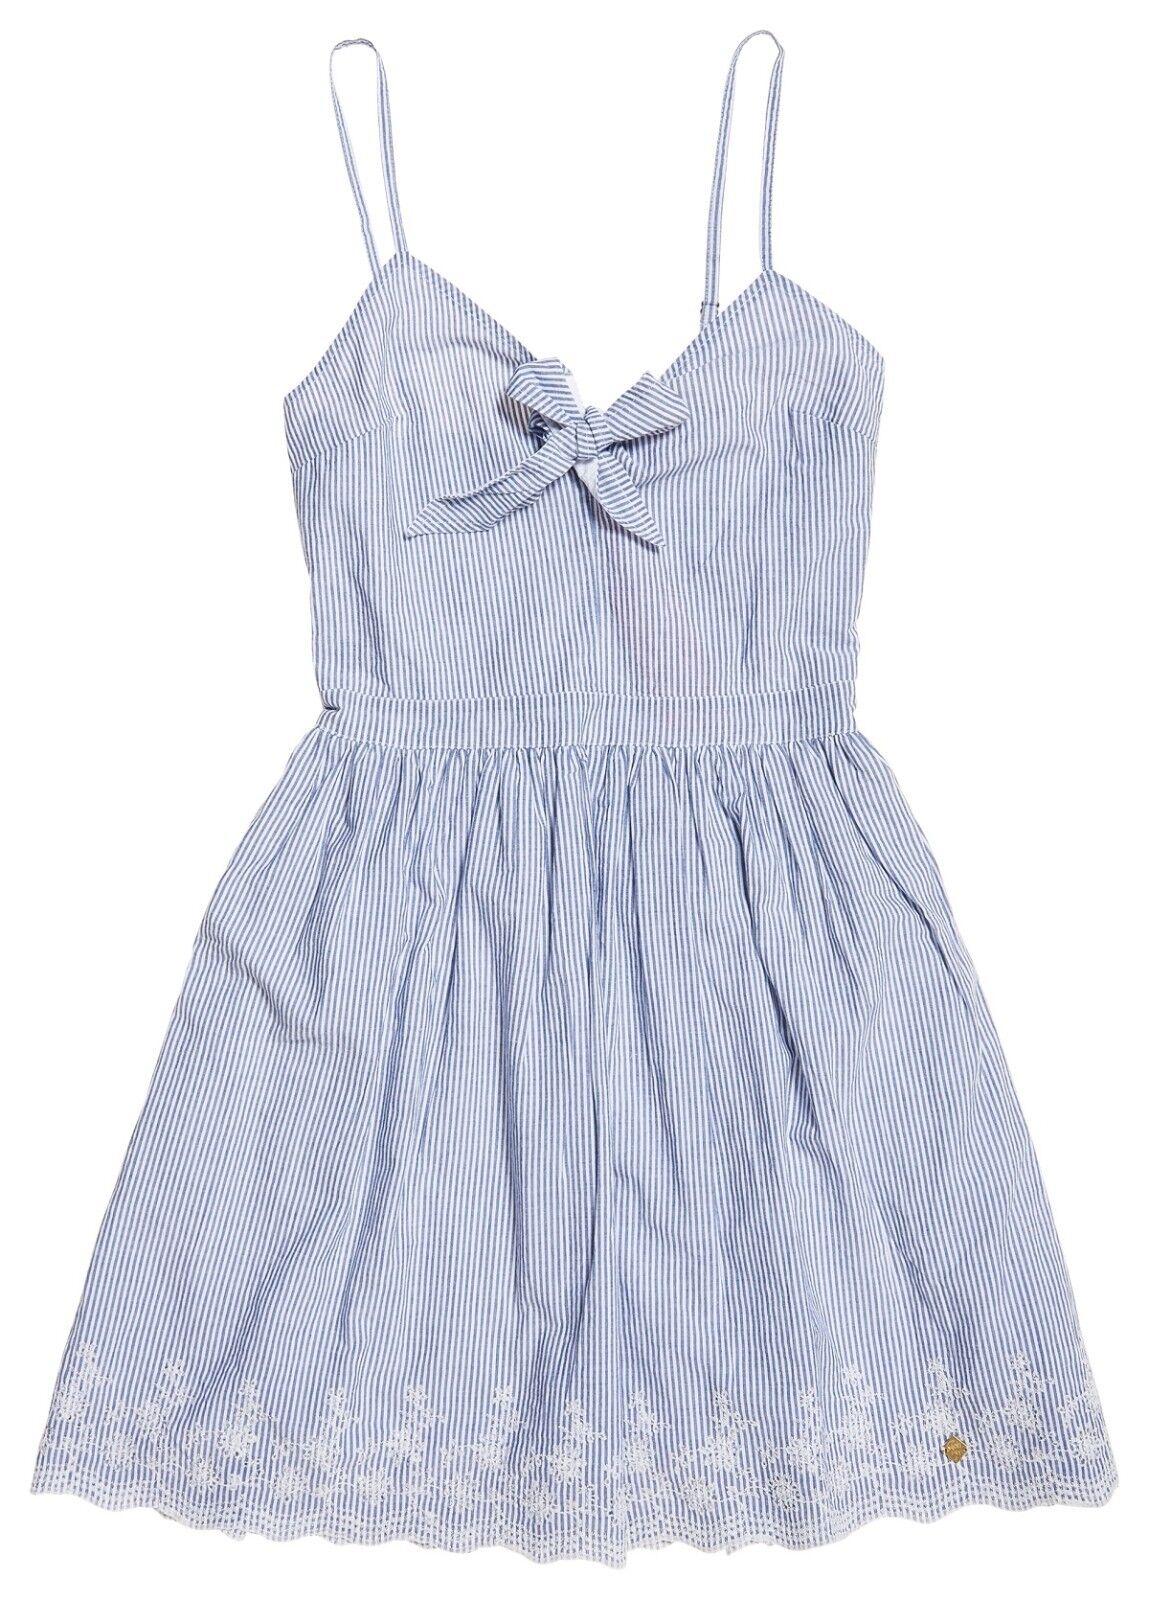 Superdry Alice KNOT DRESS blu bianca stripe